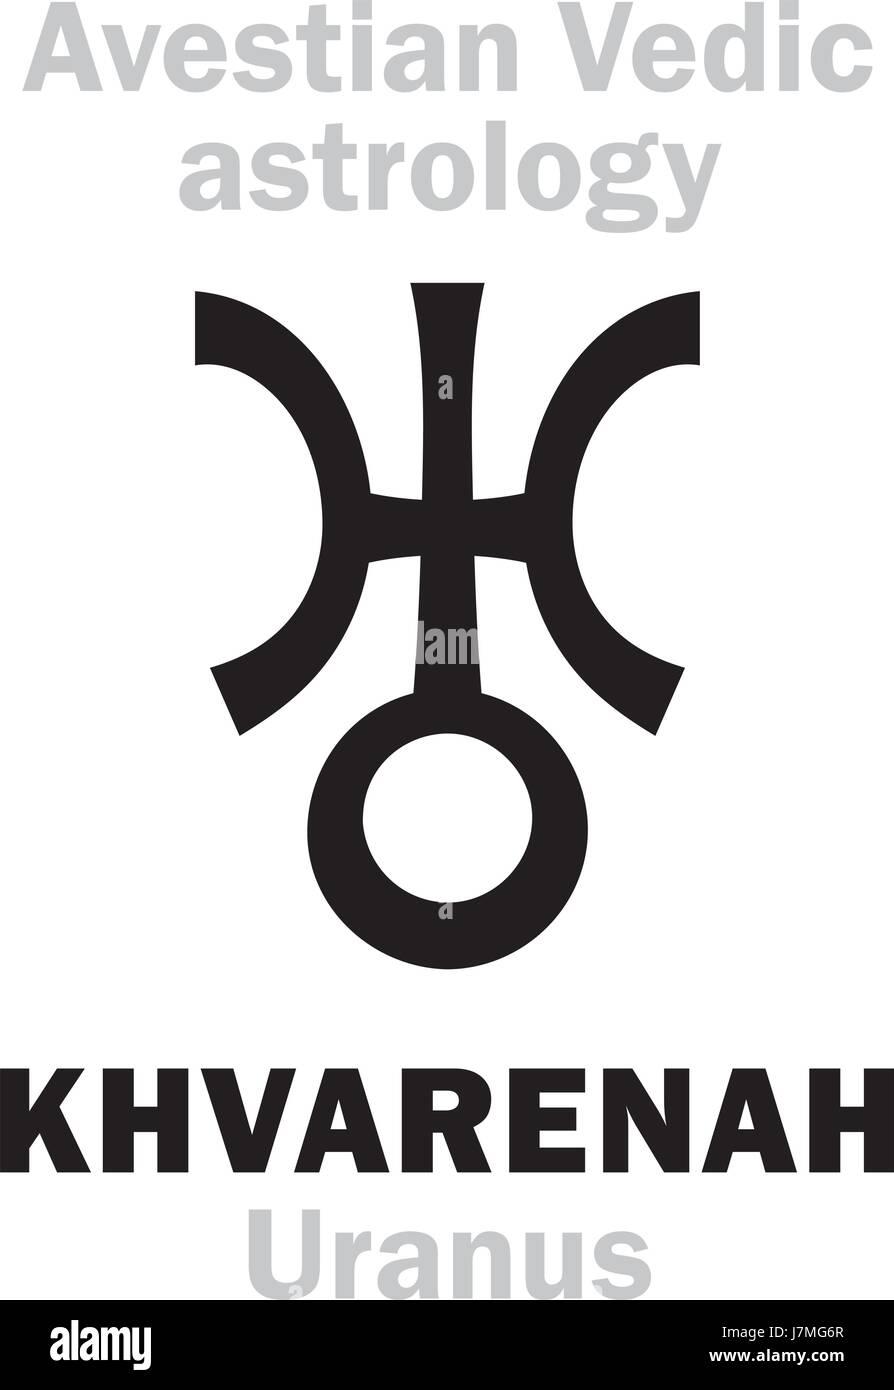 Astrology alphabet khvarenah pharn uranus avestian vedic astrology alphabet khvarenah pharn uranus avestian vedic planet hieroglyphics character sign single symbol buycottarizona